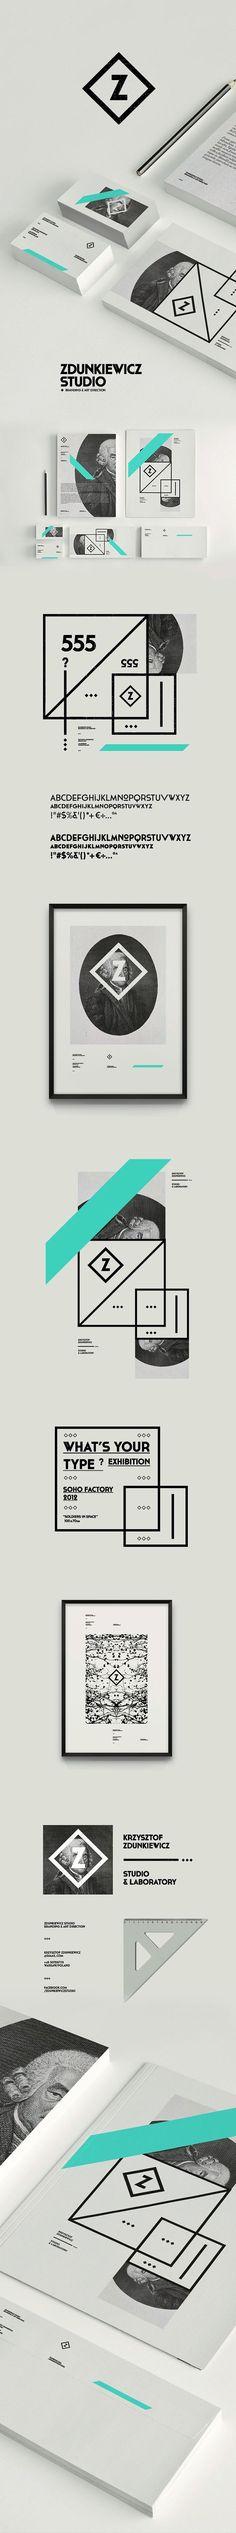 Branding/Identity / via Zdunkiewicz Studio / Self Promotion on Behance Design Web, Logo Design, Brand Identity Design, Graphic Design Typography, Graphic Design Illustration, Layout Design, Creative Typography, Design Illustrations, Design Agency